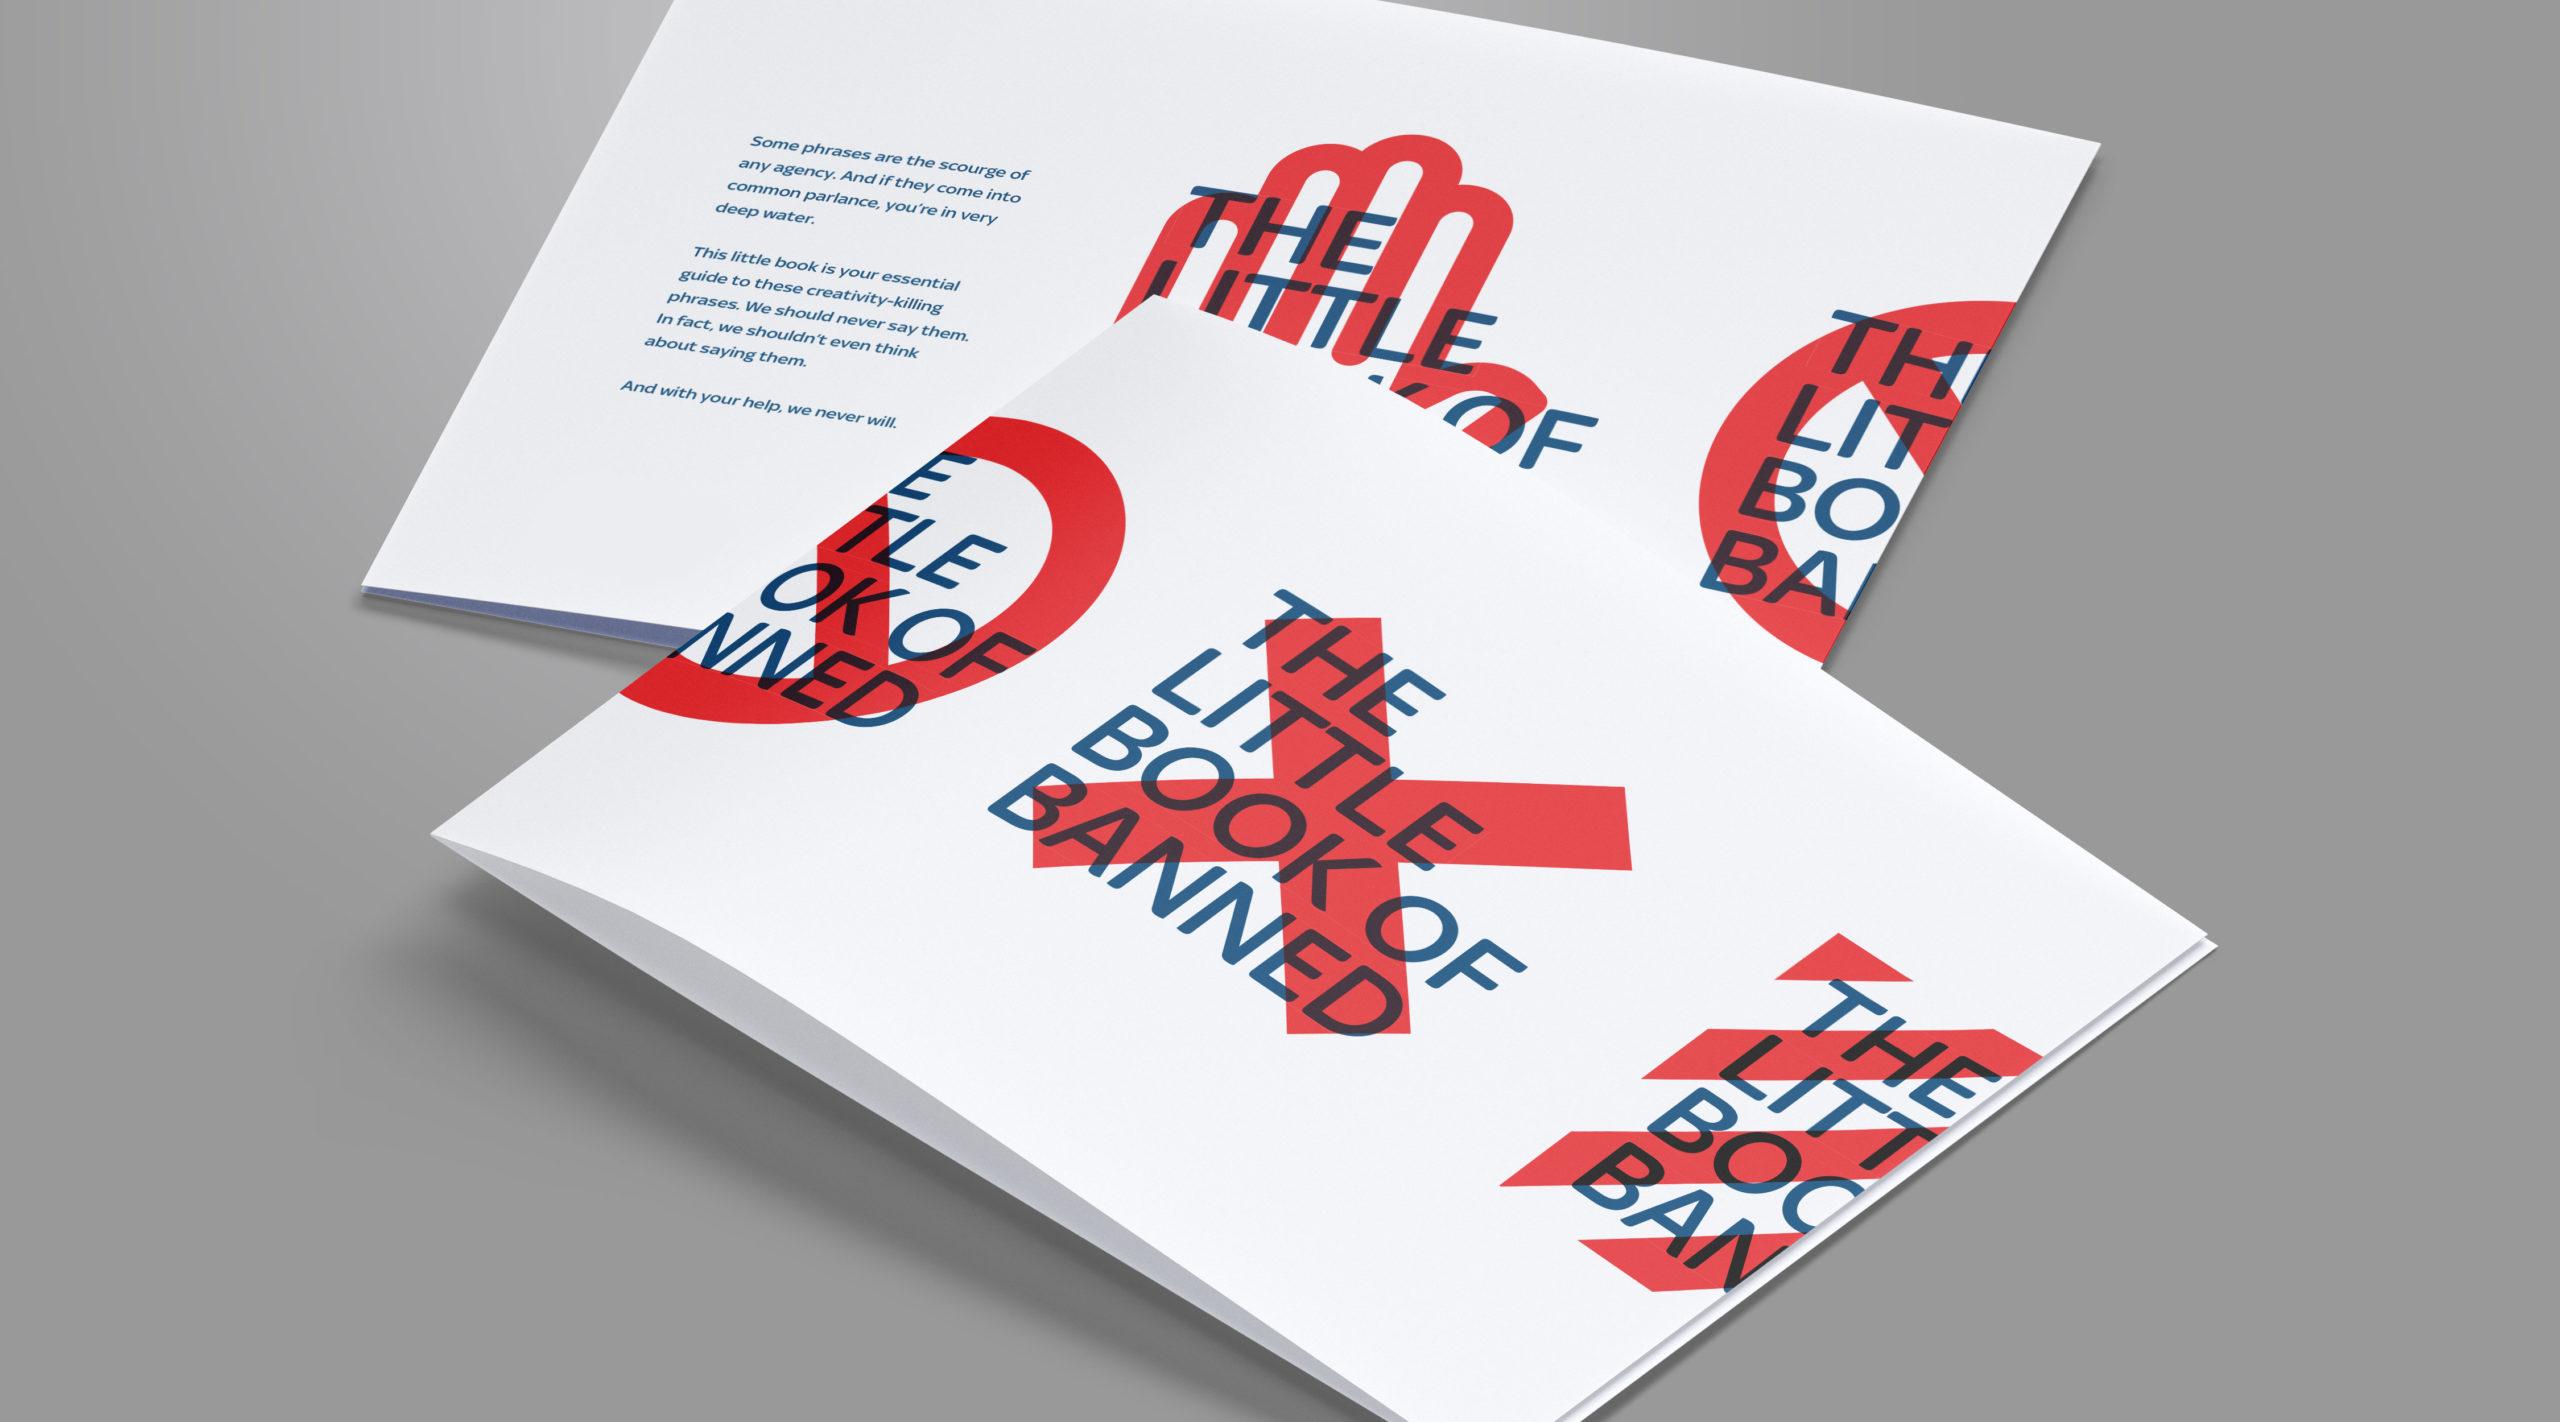 901342-a4-landscape-bi-fold-brochure-mockups-03